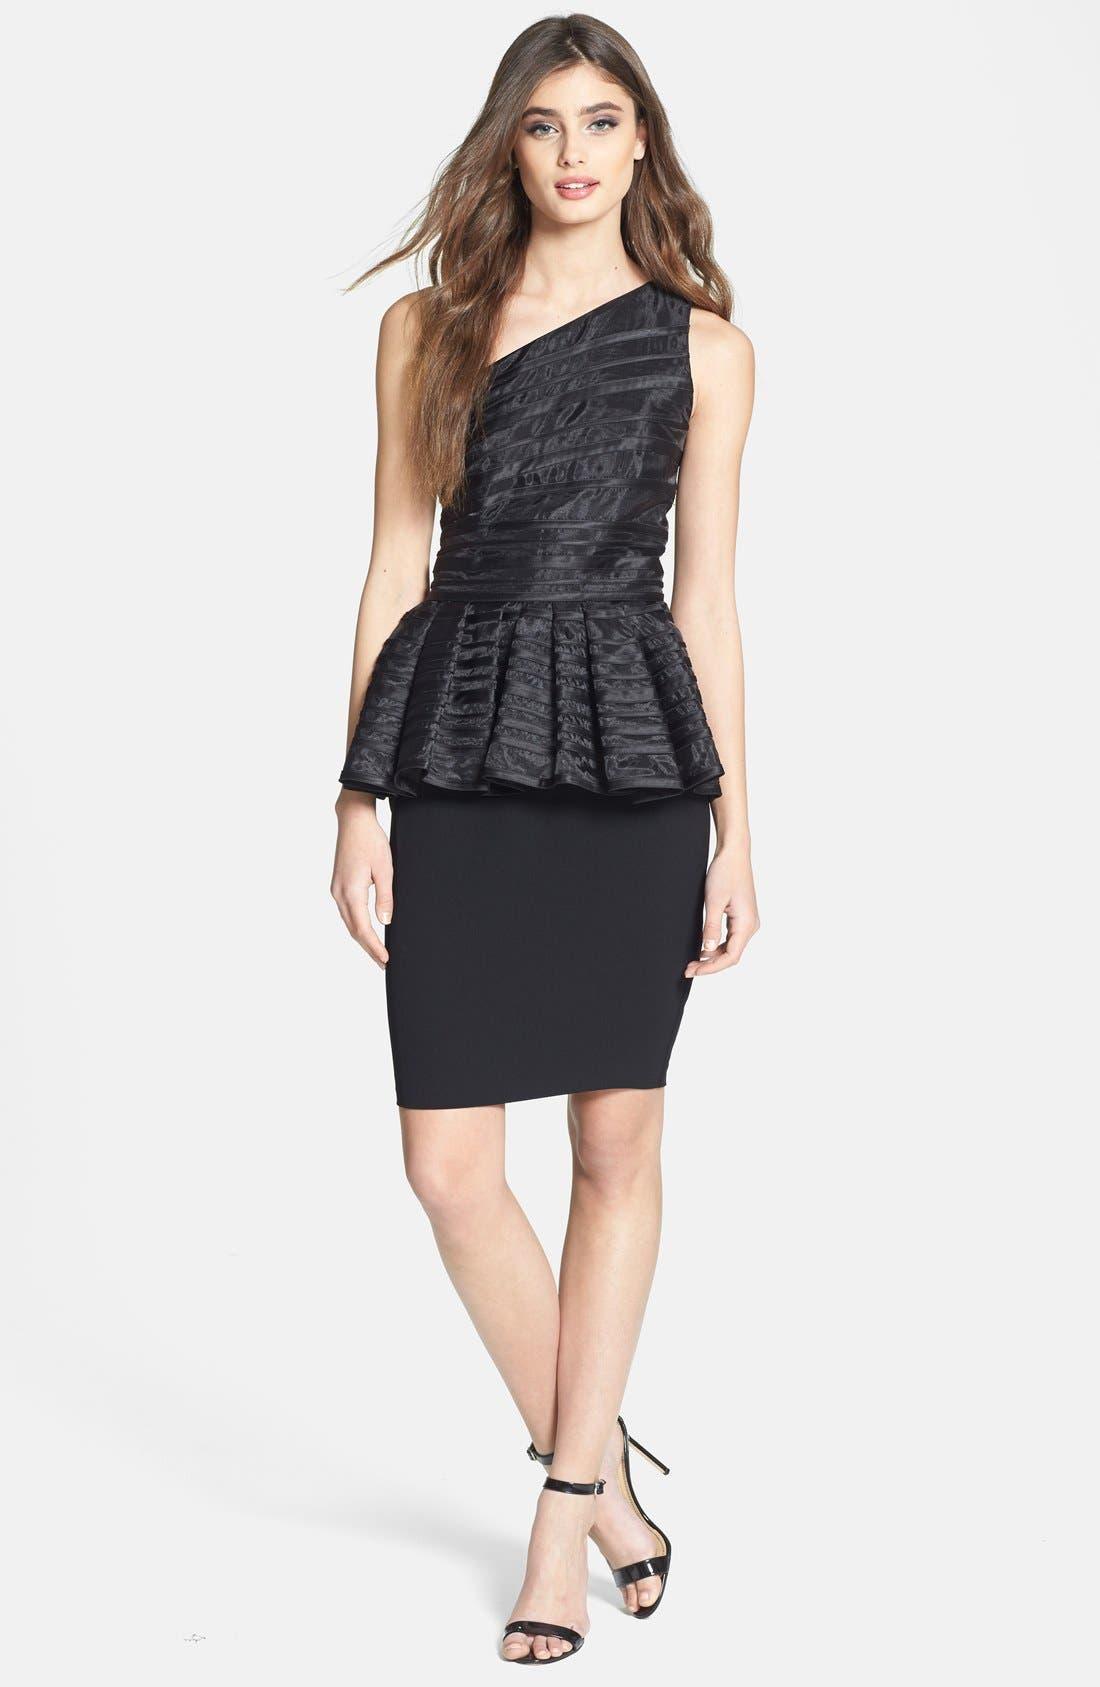 Alternate Image 1 Selected - Halston Heritage One-Shoulder Peplum Mixed Media Dress